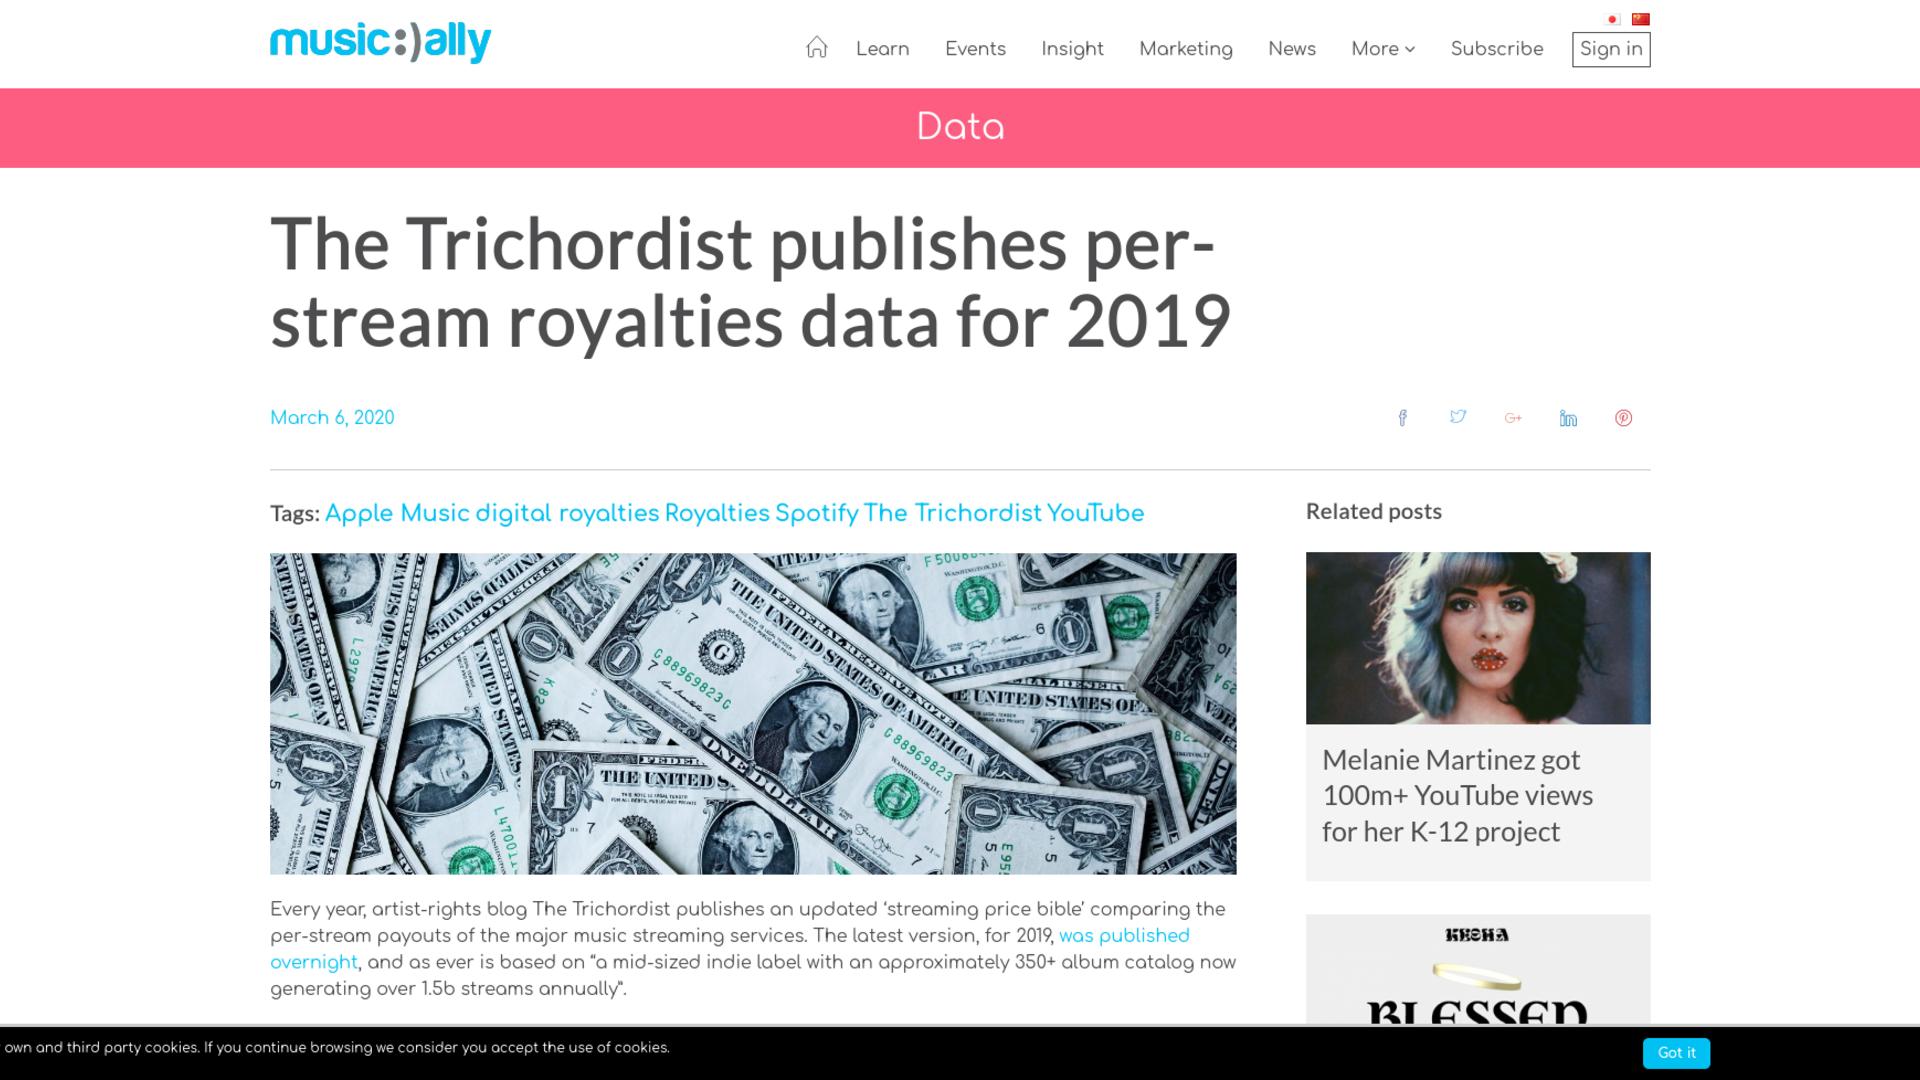 Fairness Rocks News The Trichordist publishes per-stream royalties data for 2019